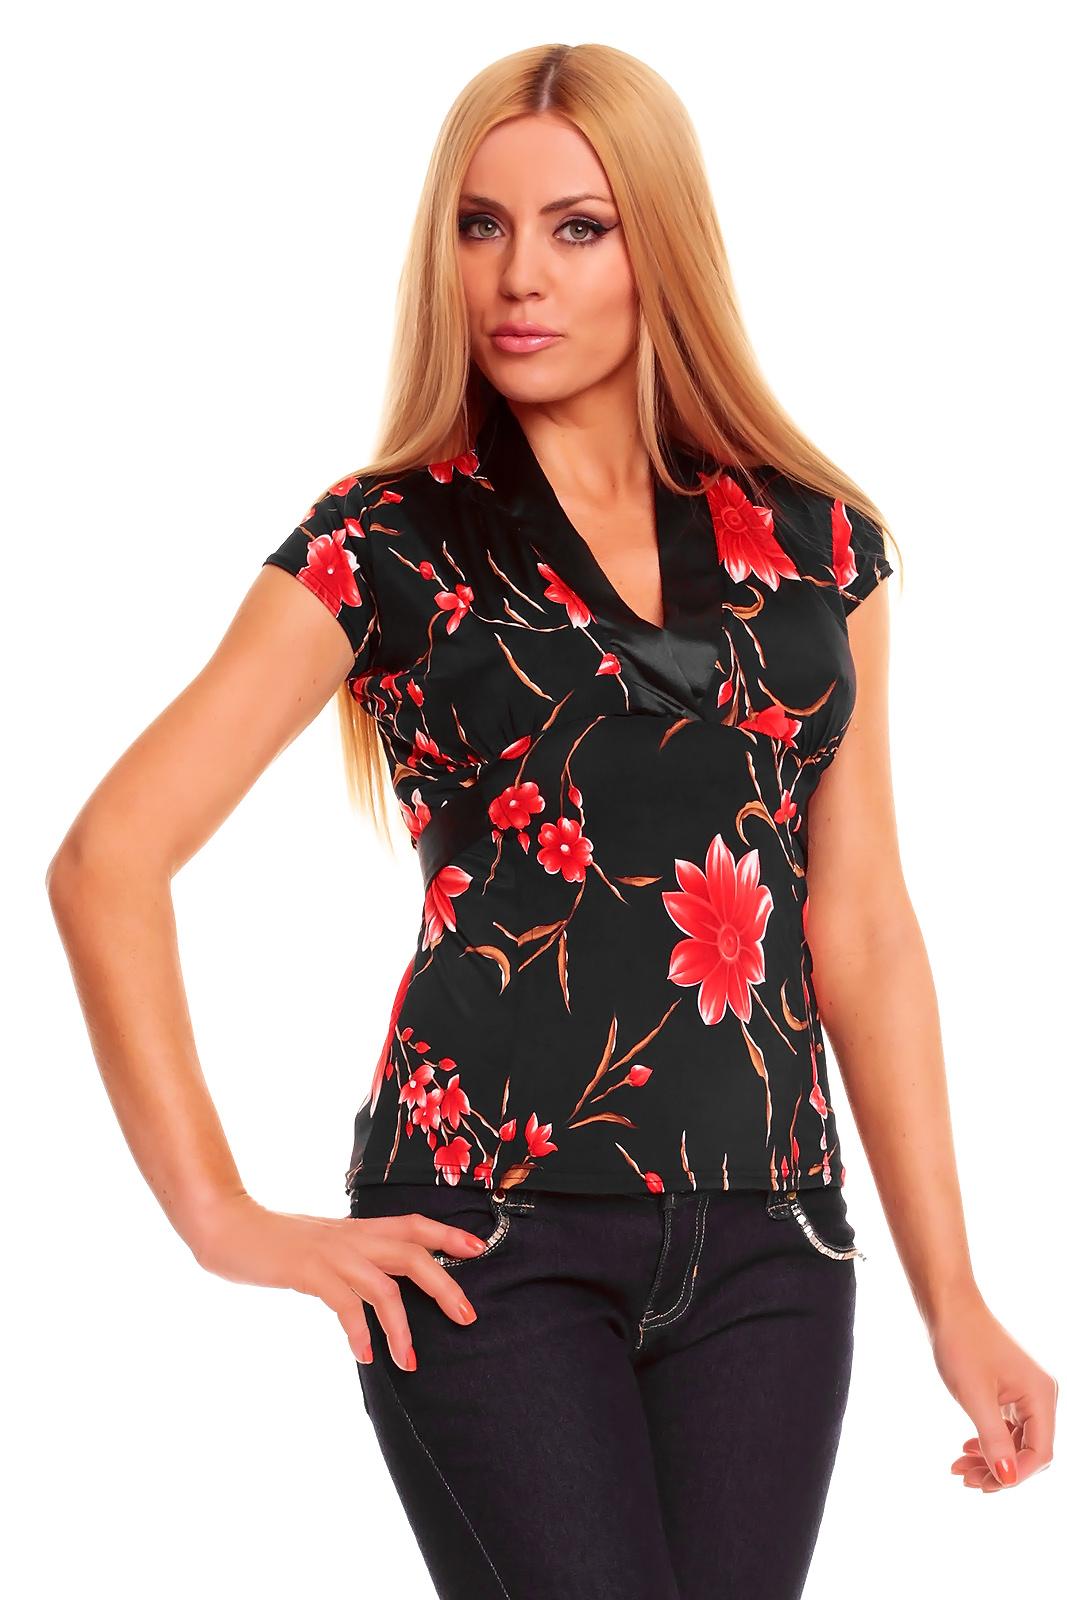 fbf9fc22a405 Elegantné tričko tunika Ruby